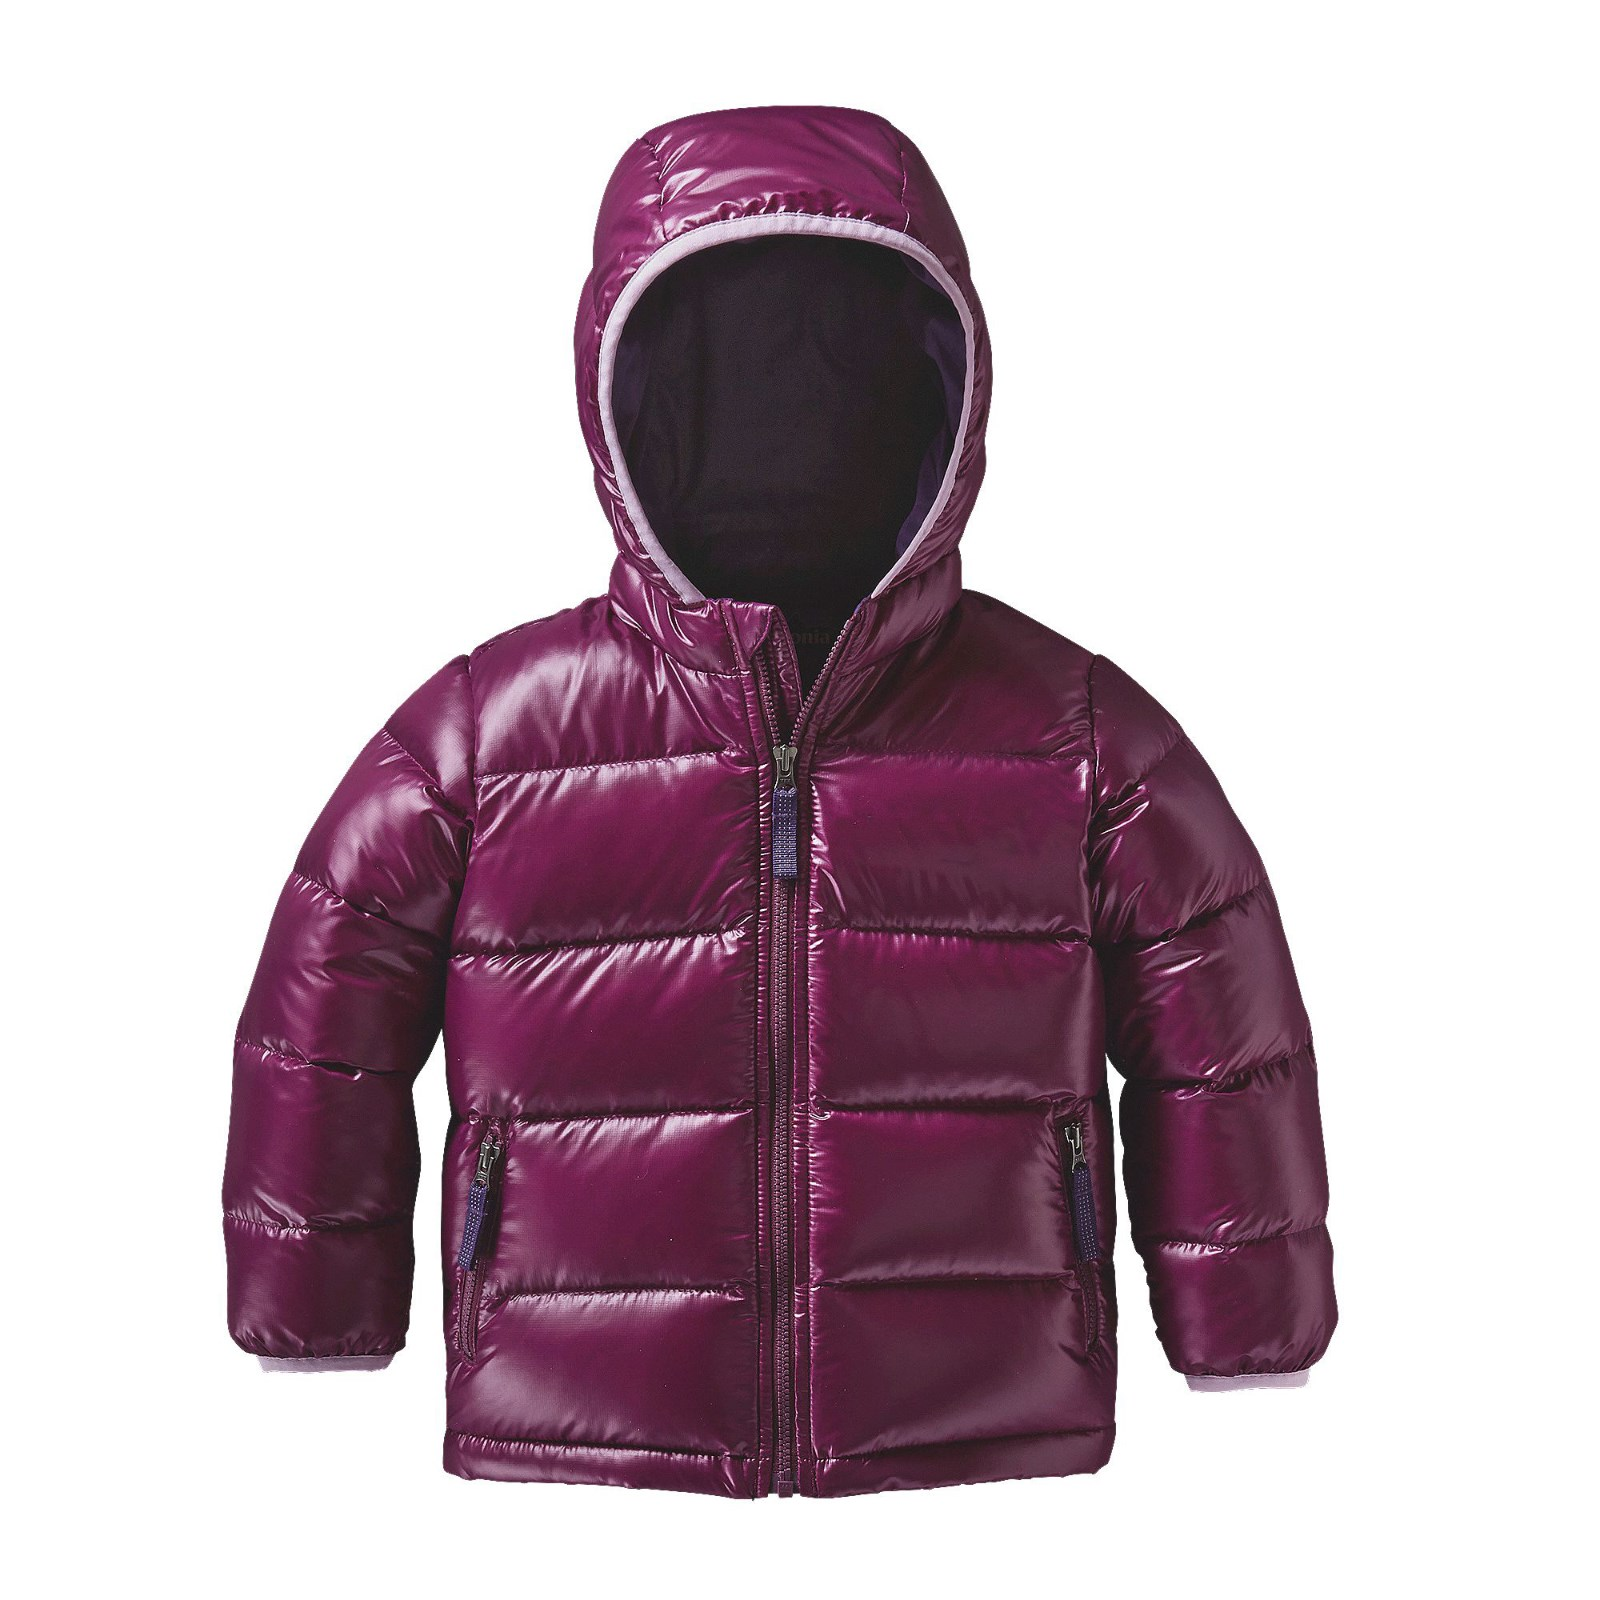 Baby Hi-loft Down Jacket Hoody Manufacturers, Baby Hi-loft Down Jacket Hoody Factory, Supply Baby Hi-loft Down Jacket Hoody